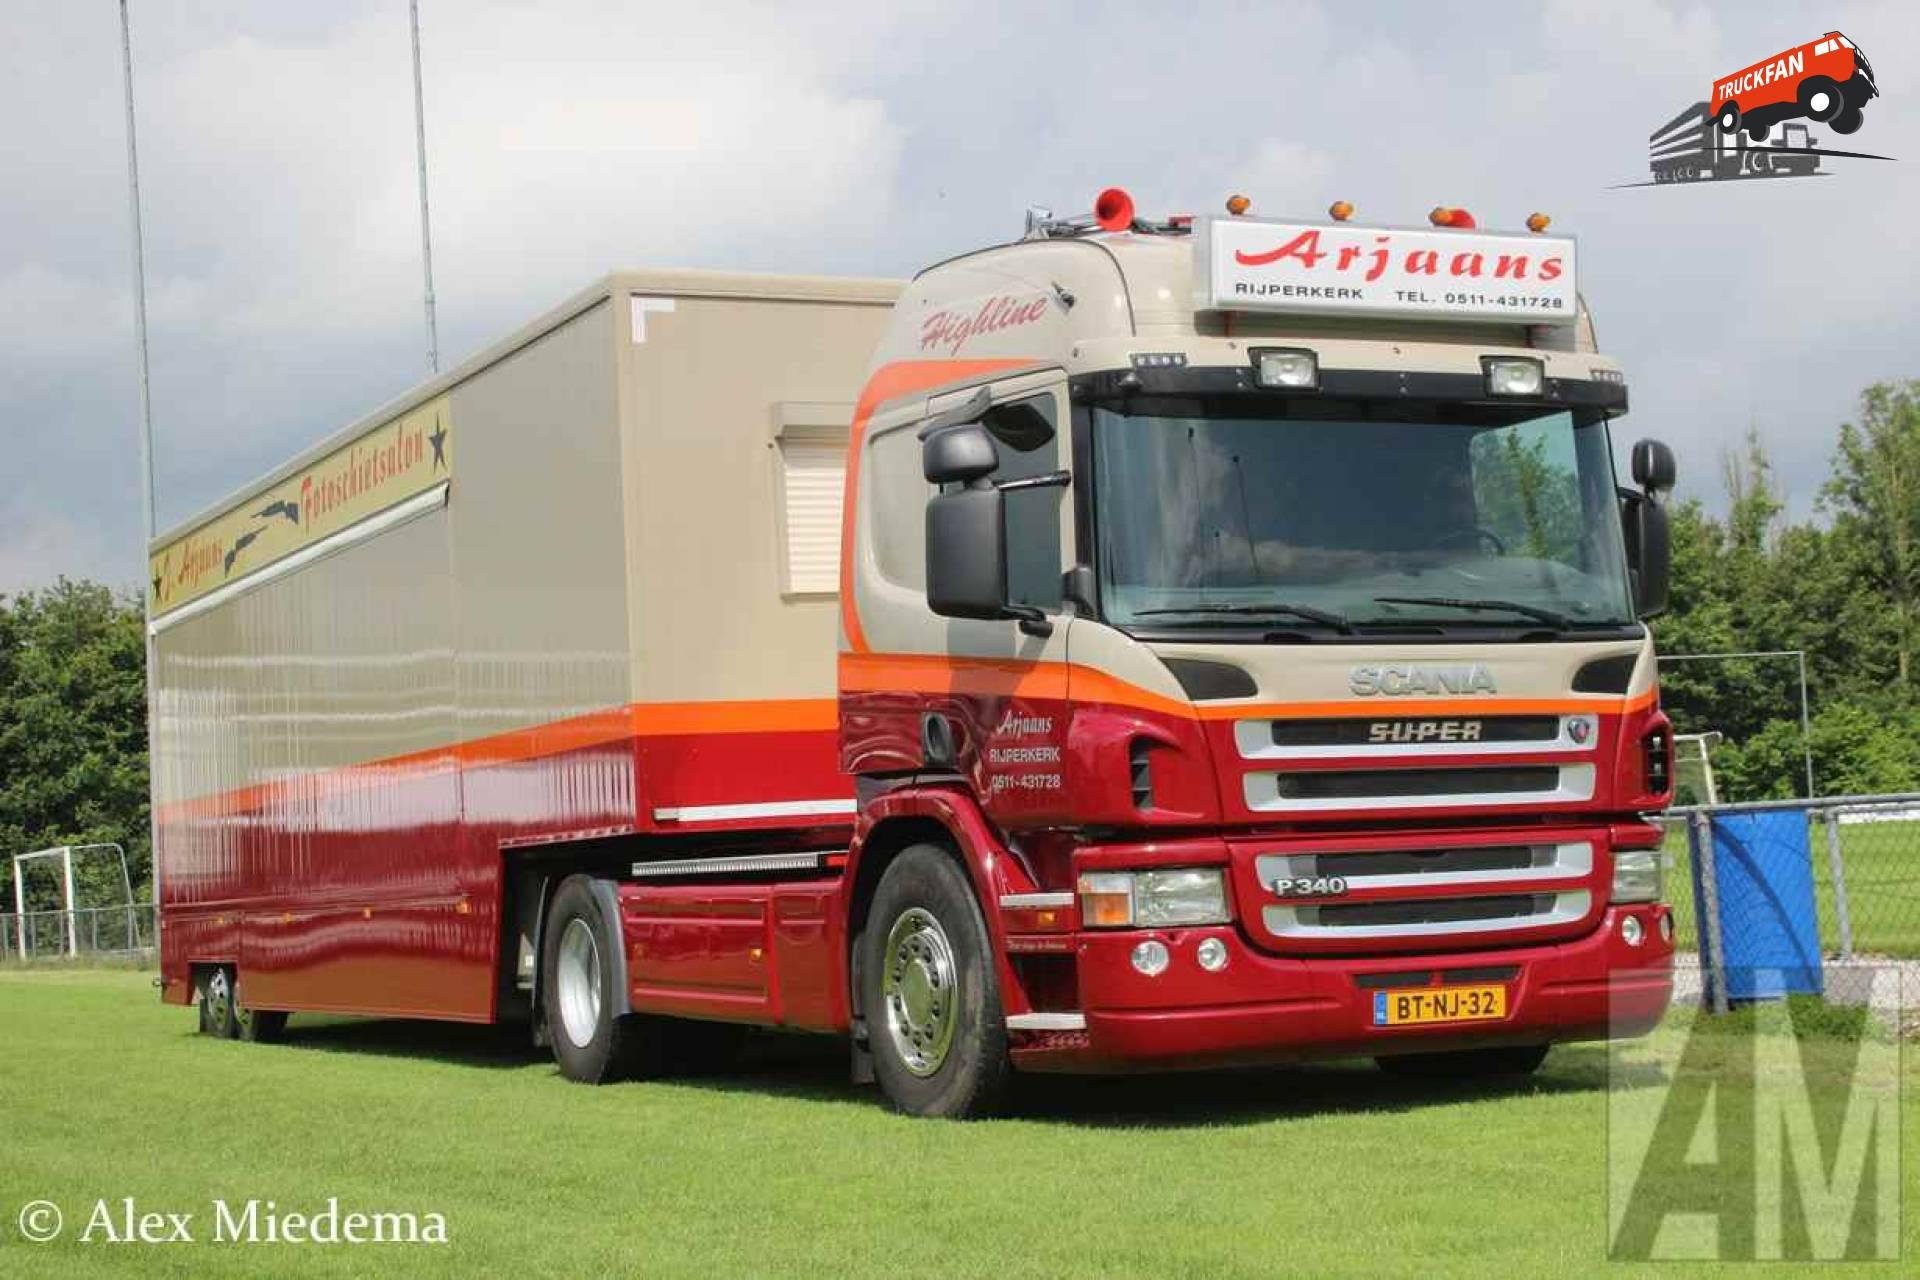 Scania P340